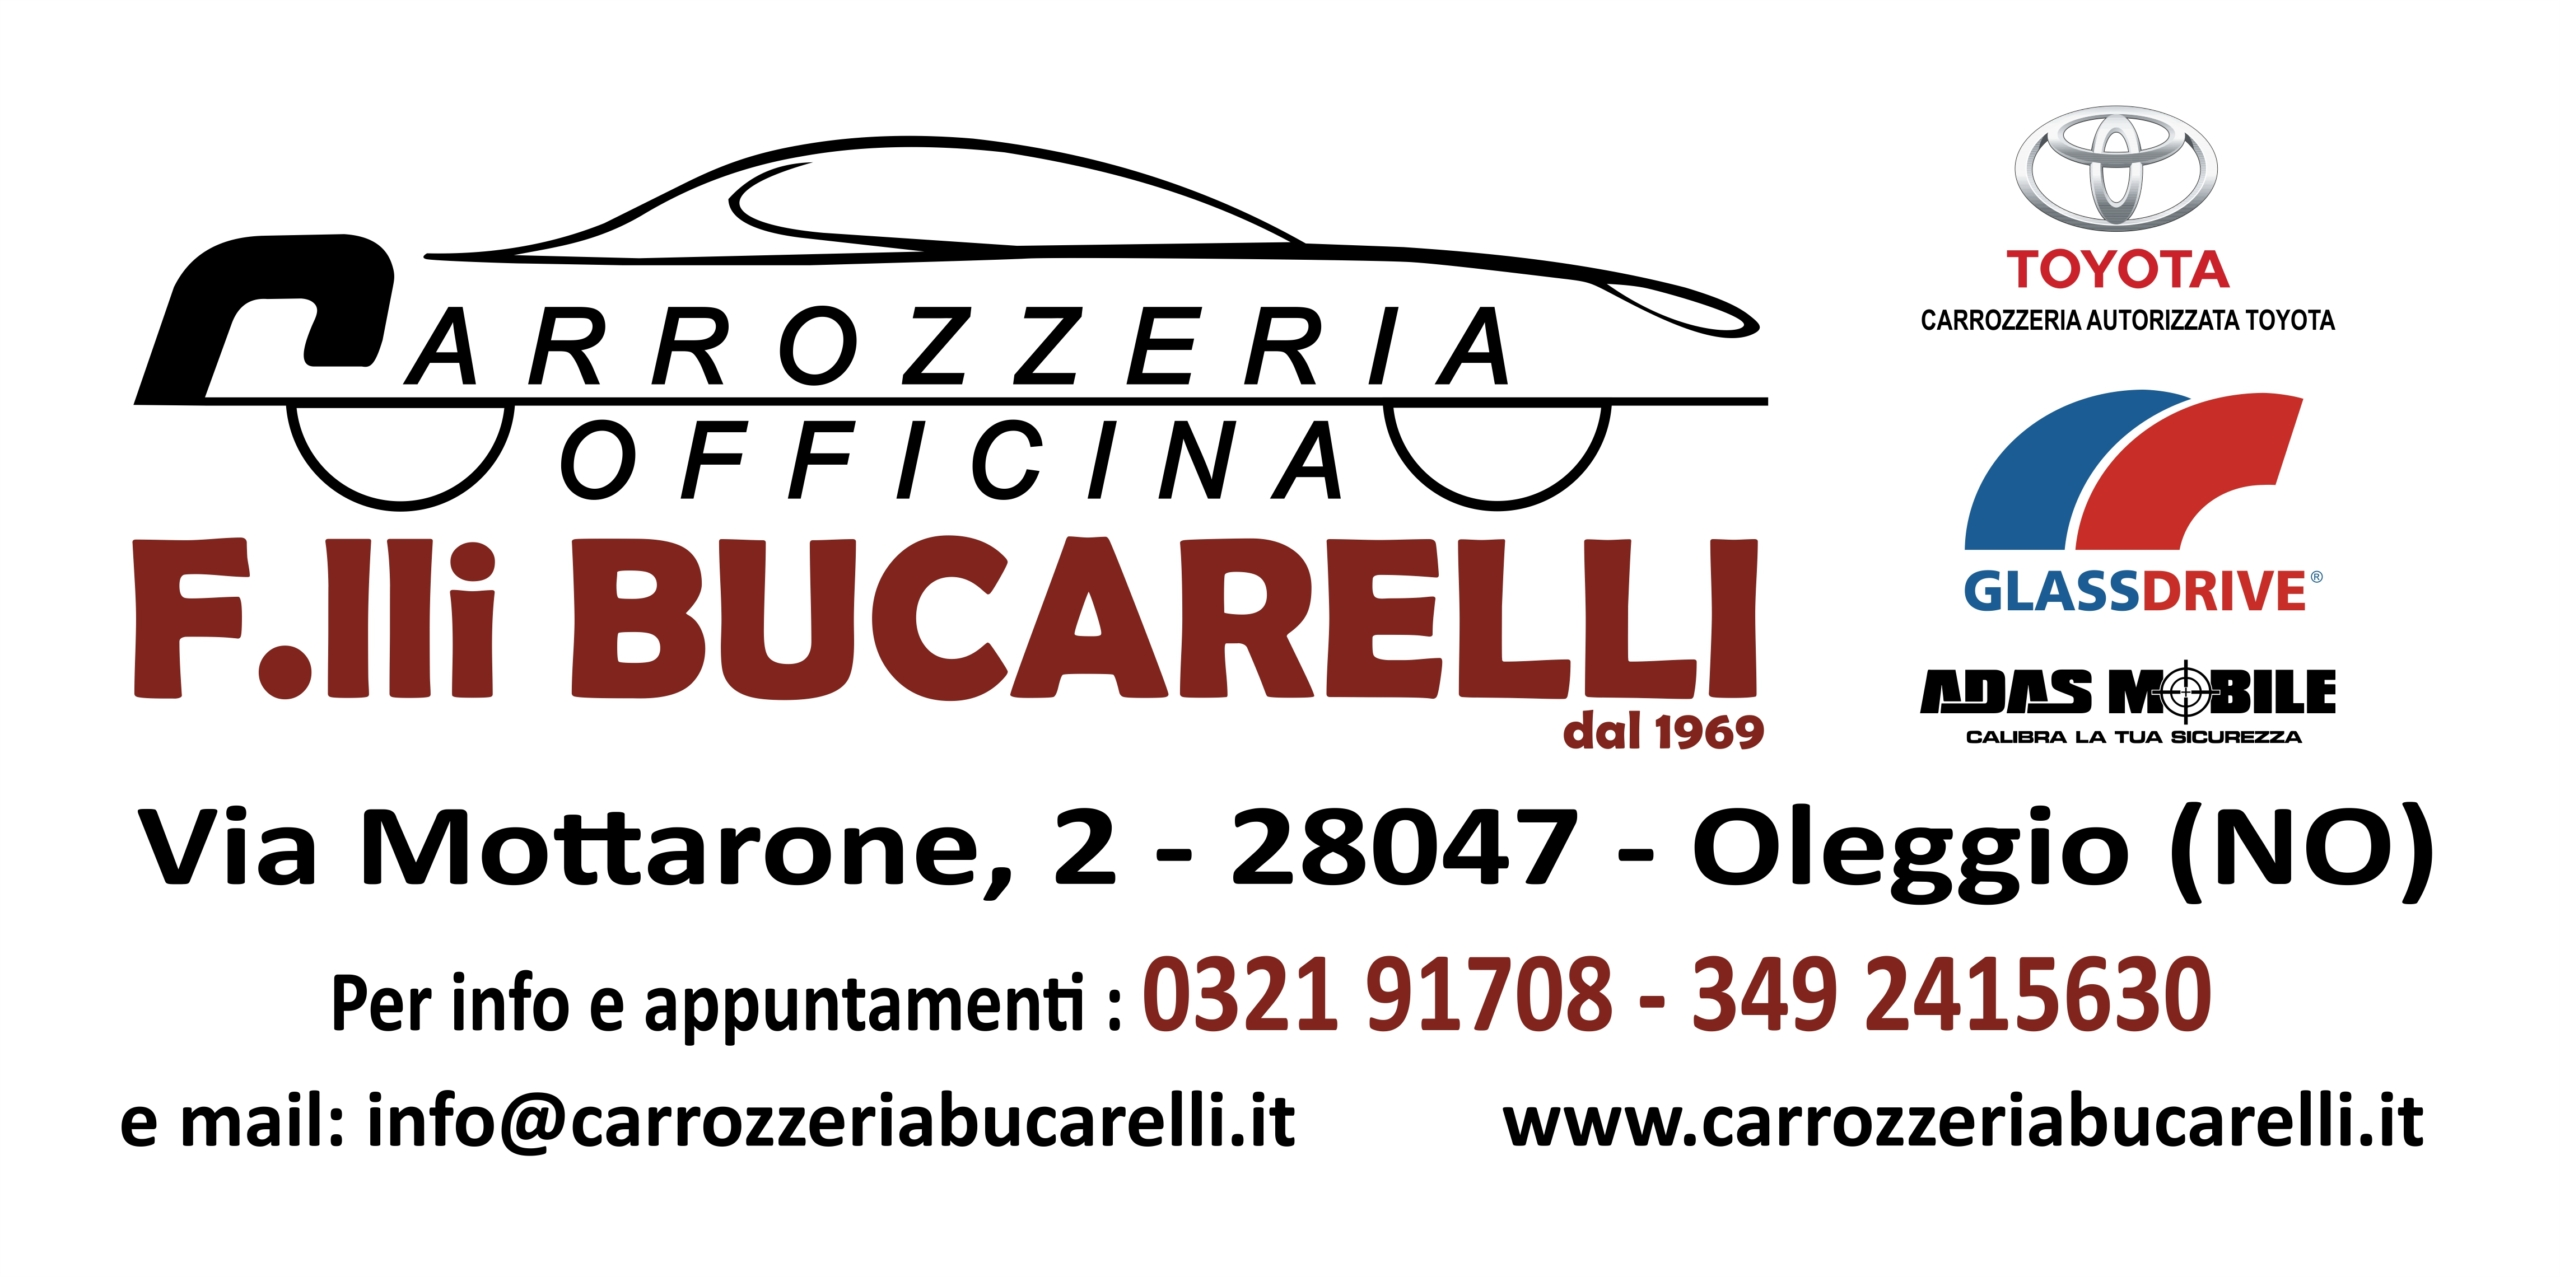 Carrozzeria F.lli Bucarelli